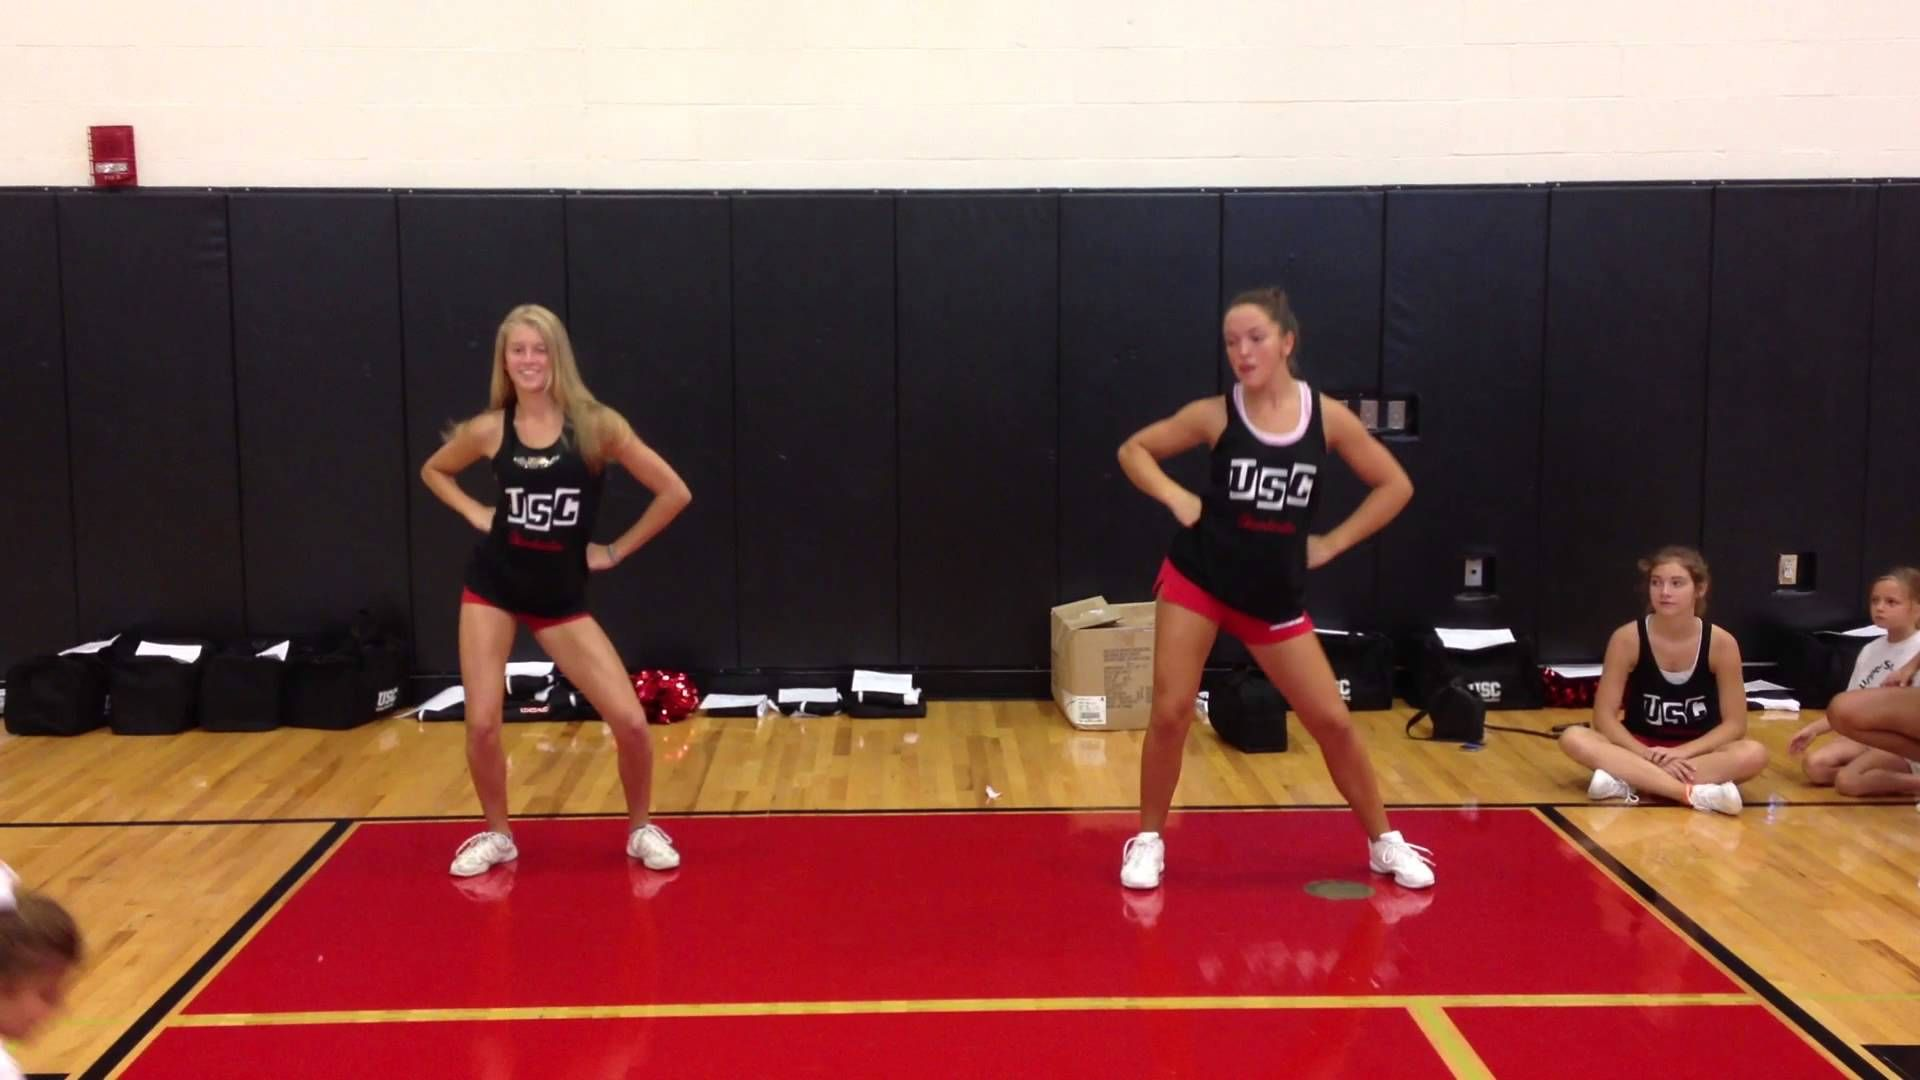 1st 2nd Grade Roar Halftime Dance Cheer Routines Cheer Dance Routines Youth Cheer